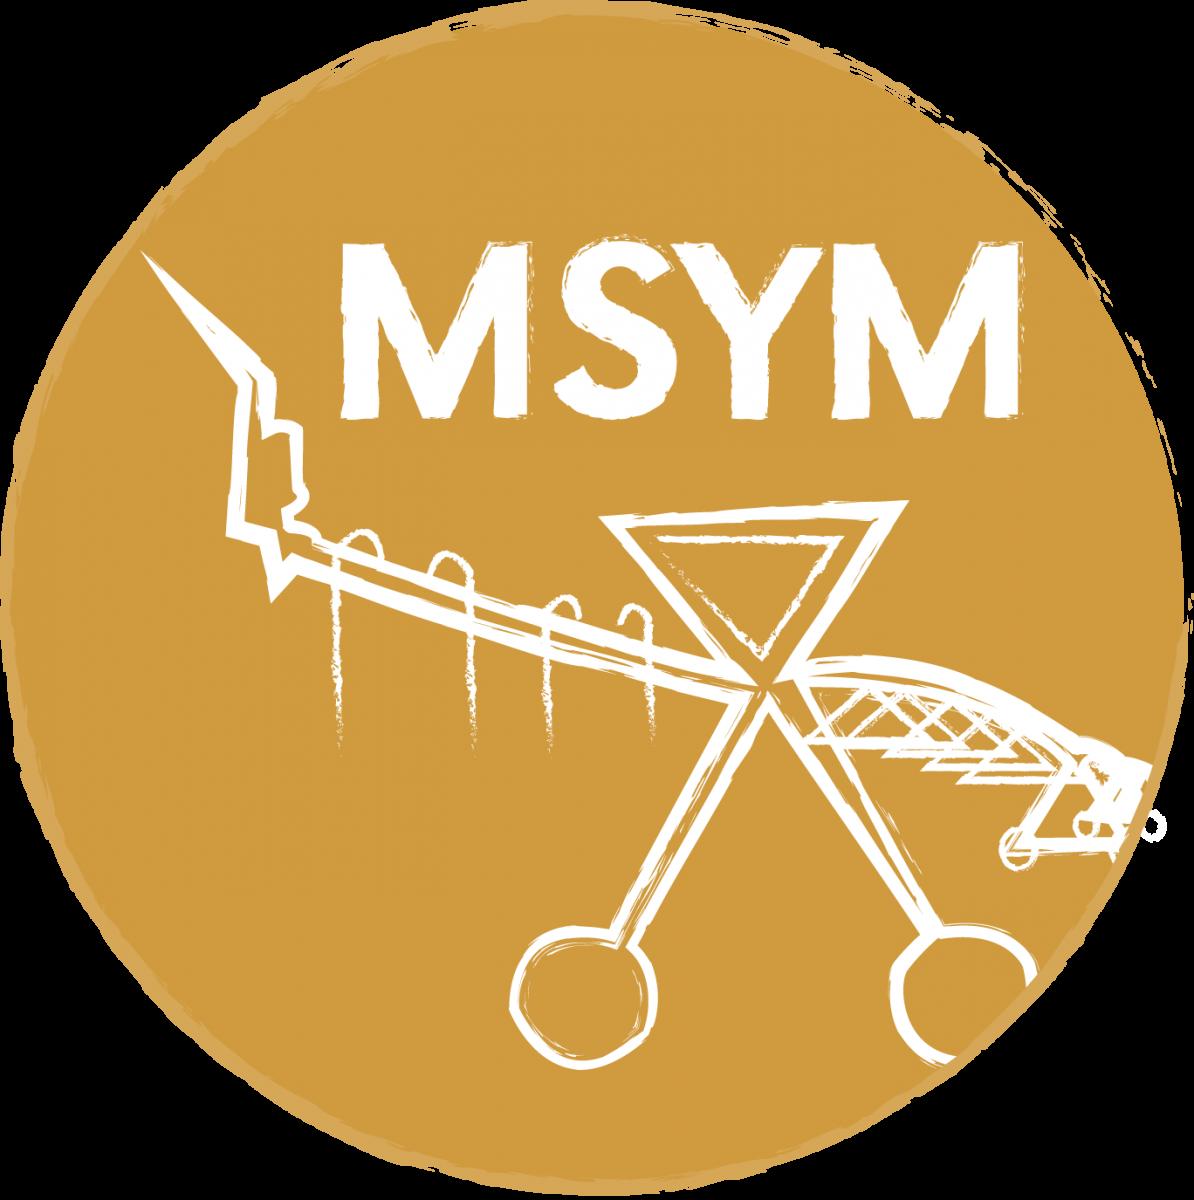 Manager clipart operational control. Processing operations mysym nebraska